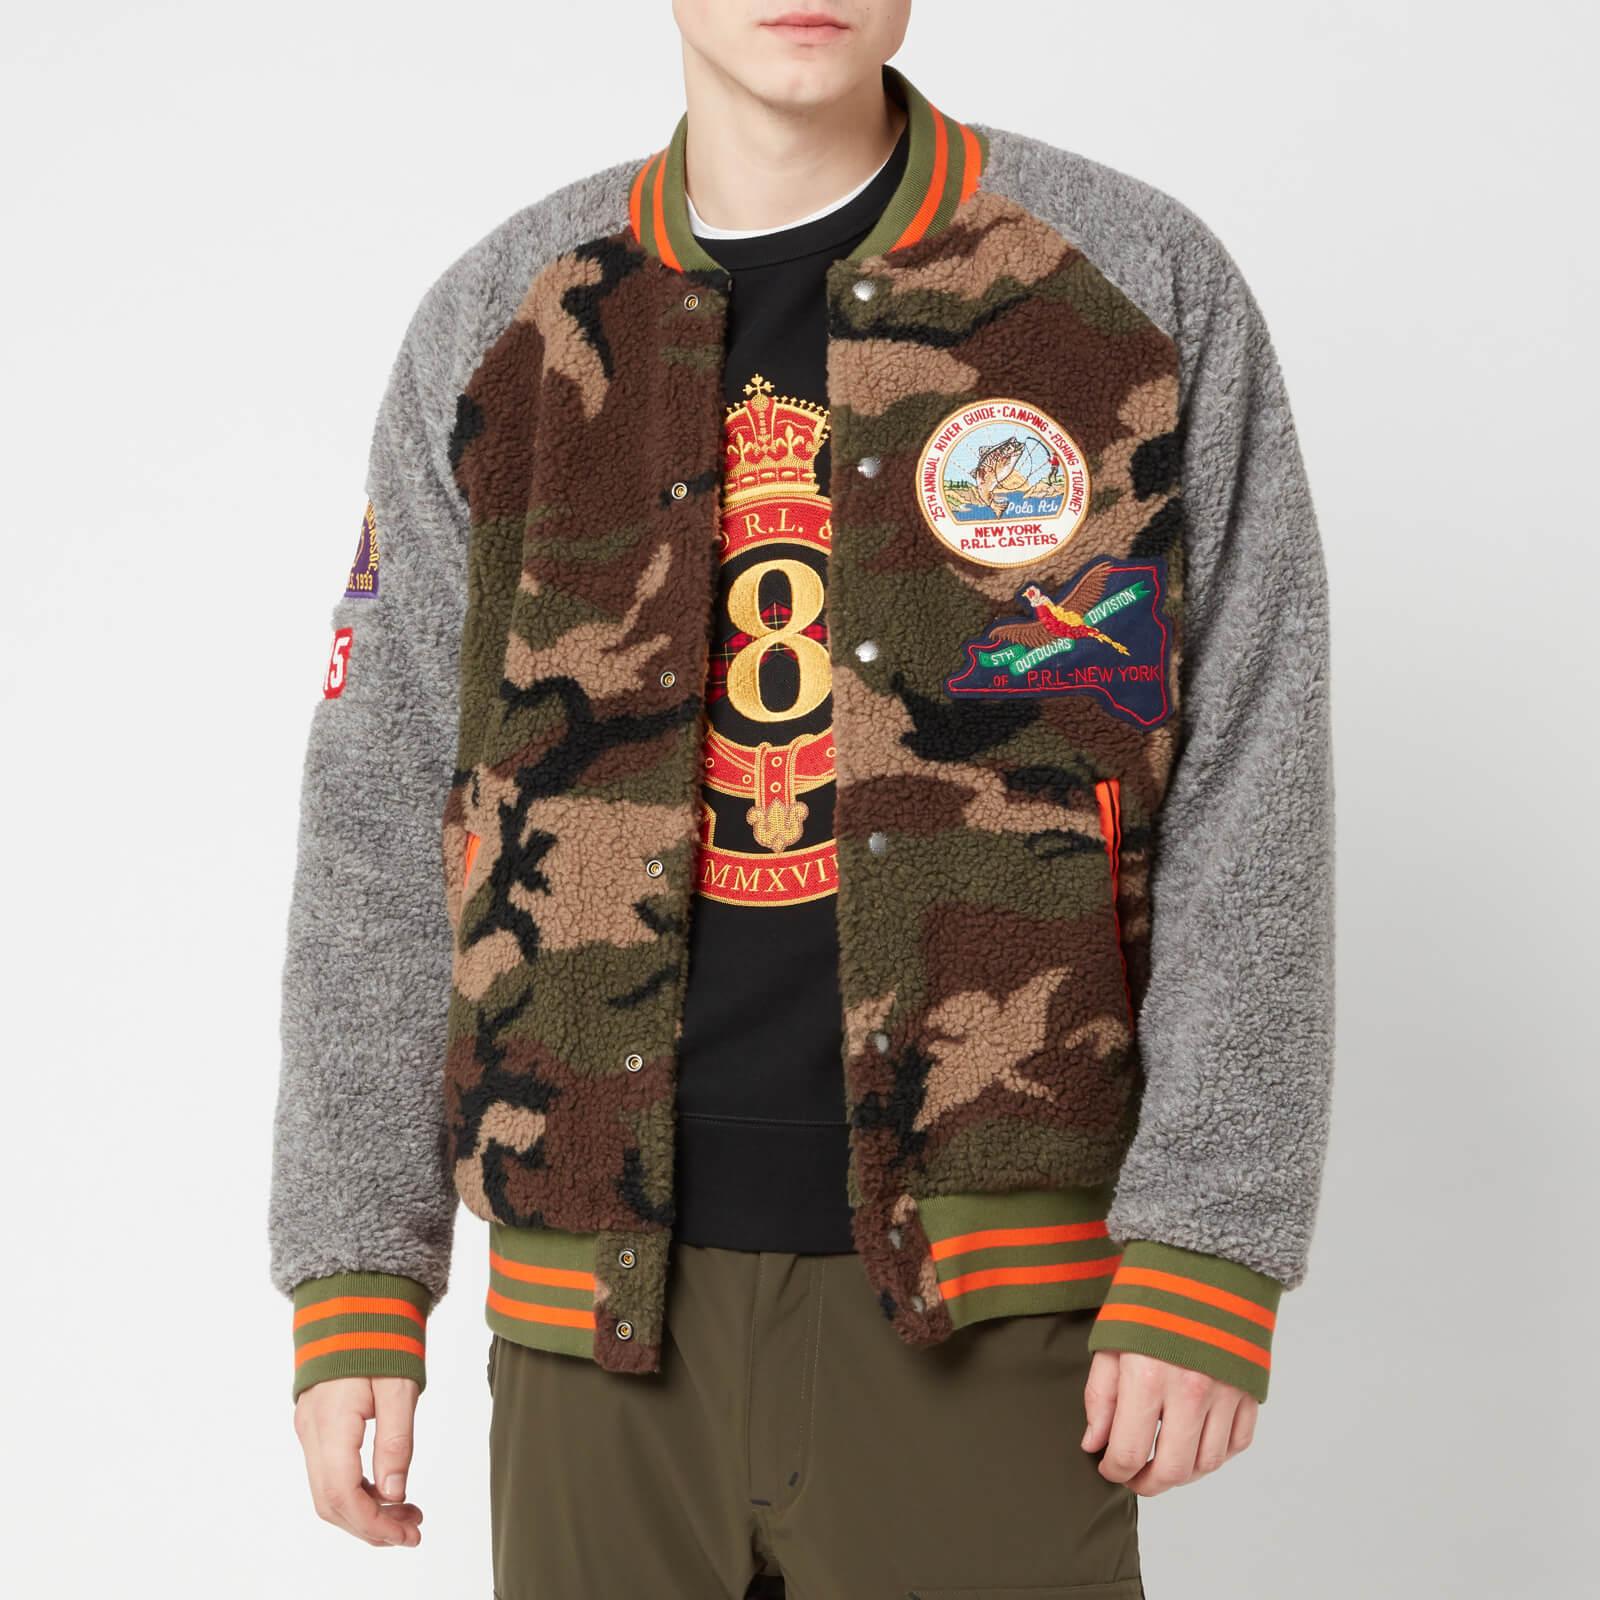 Ralph Vintage Bomber Heather Lauren Sherpa Fleece Camodark Men's Jacket Polo TFJ31ulcK